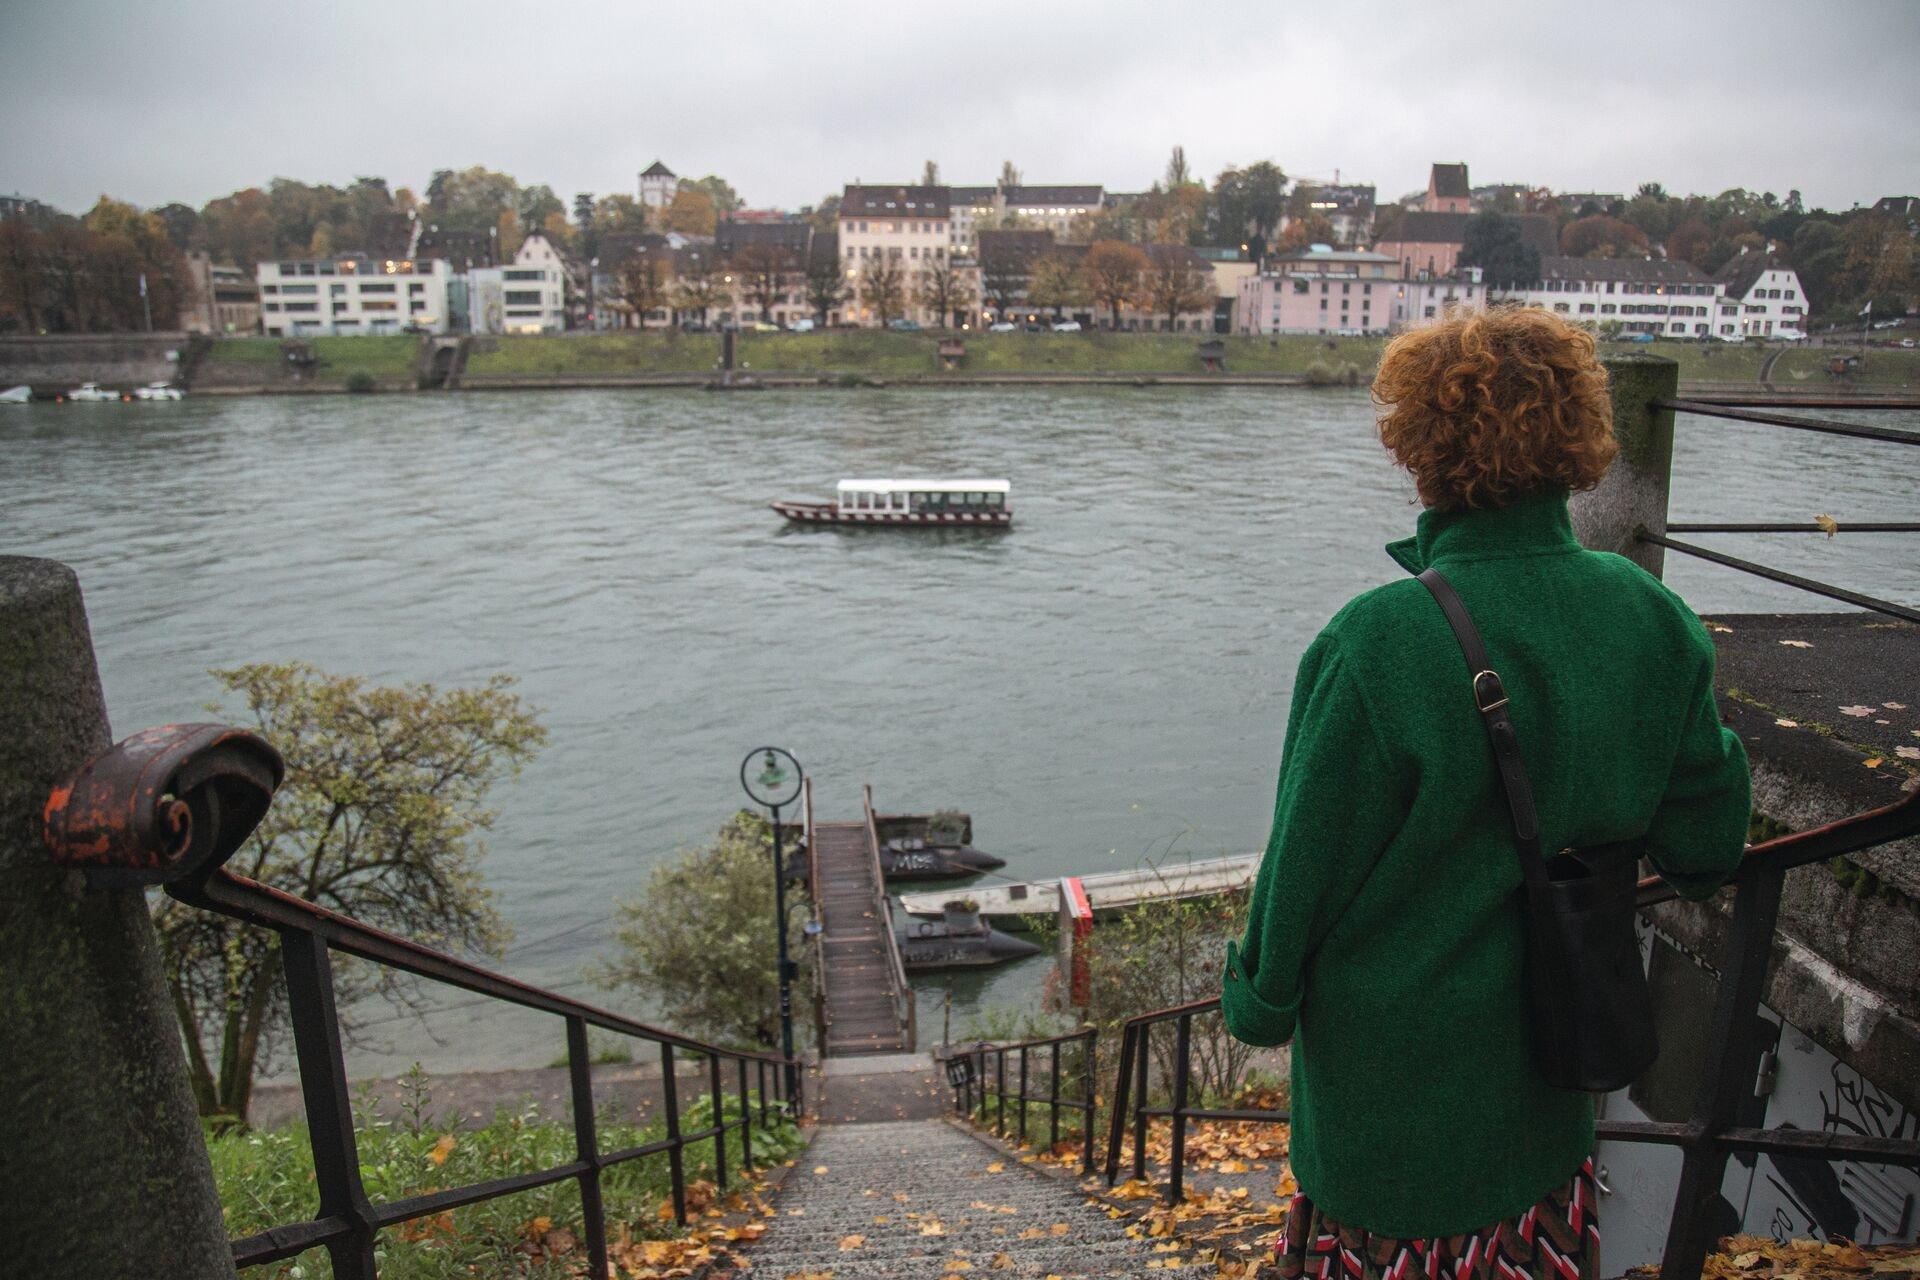 Serena Confalonieri, Basel, Best of